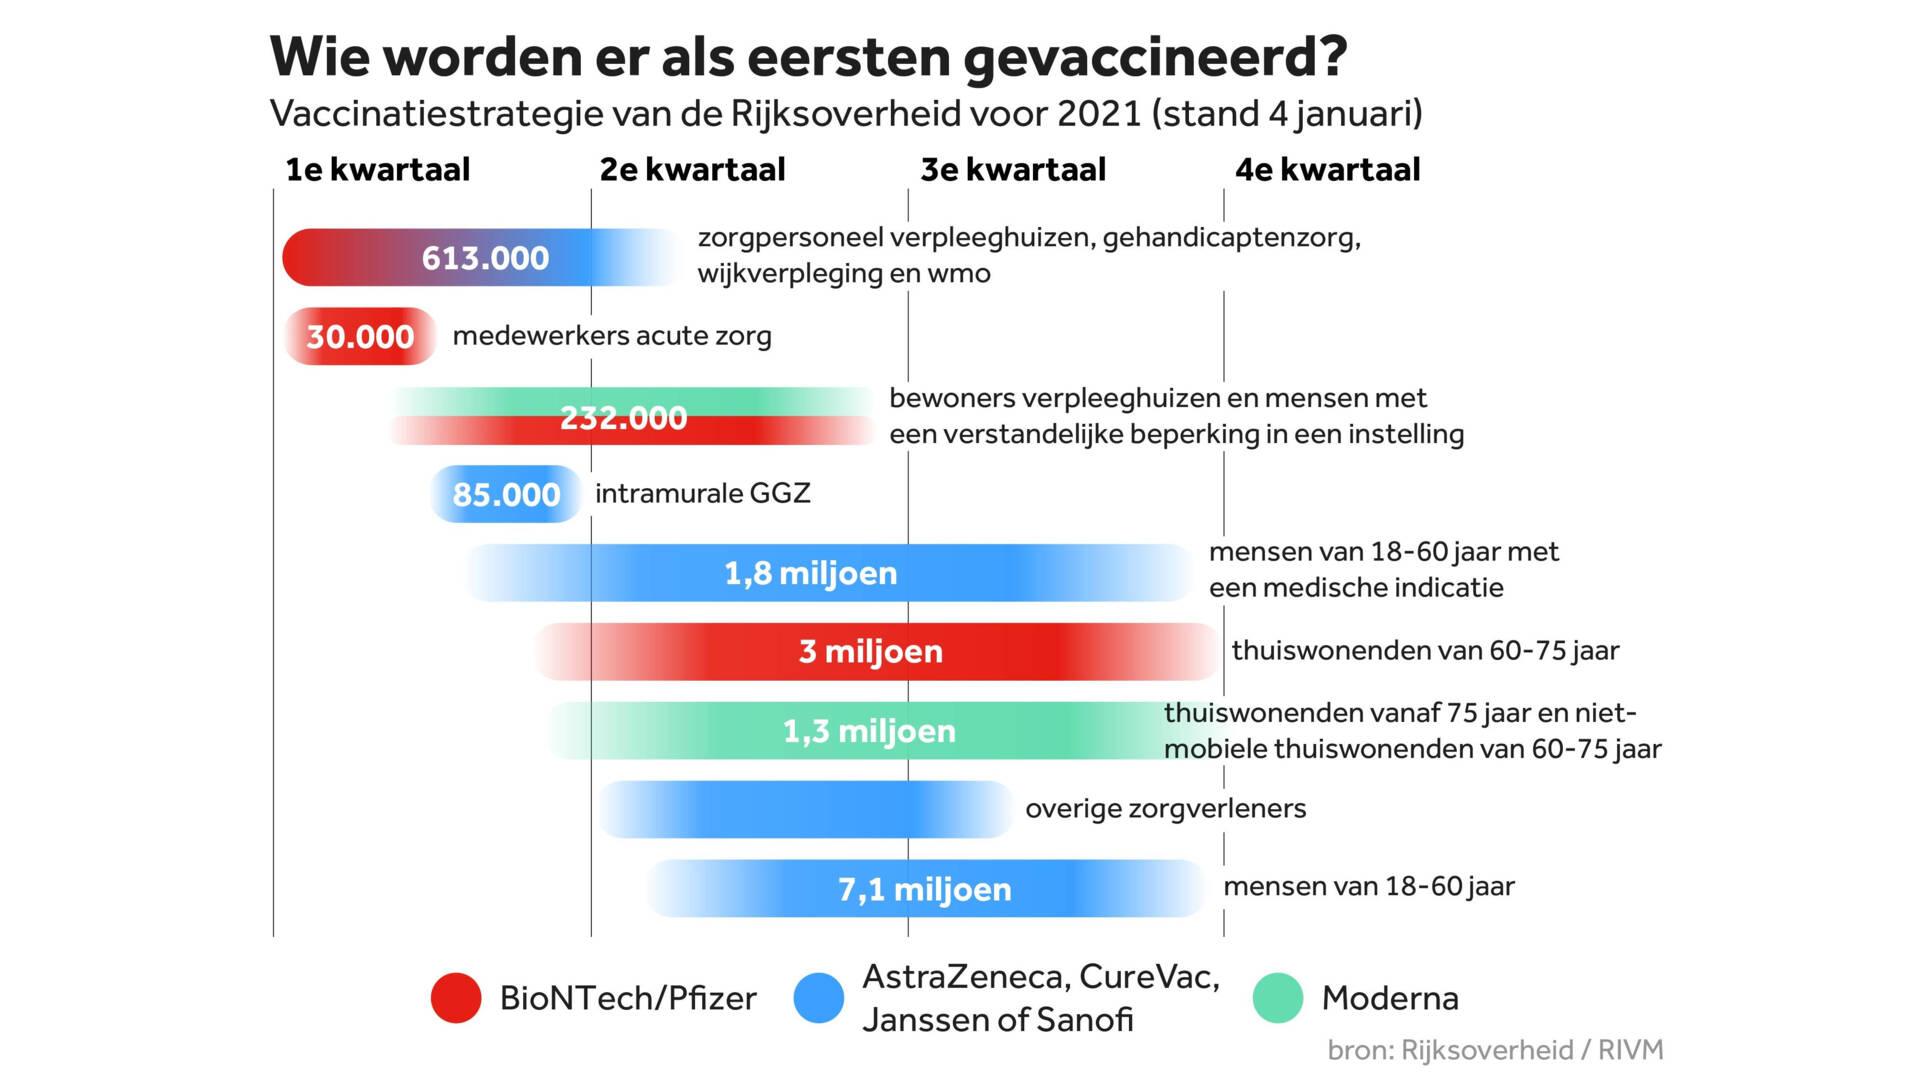 https://cdn.nos.nl/image/2021/01/05/704469/1920x1080a.jpg